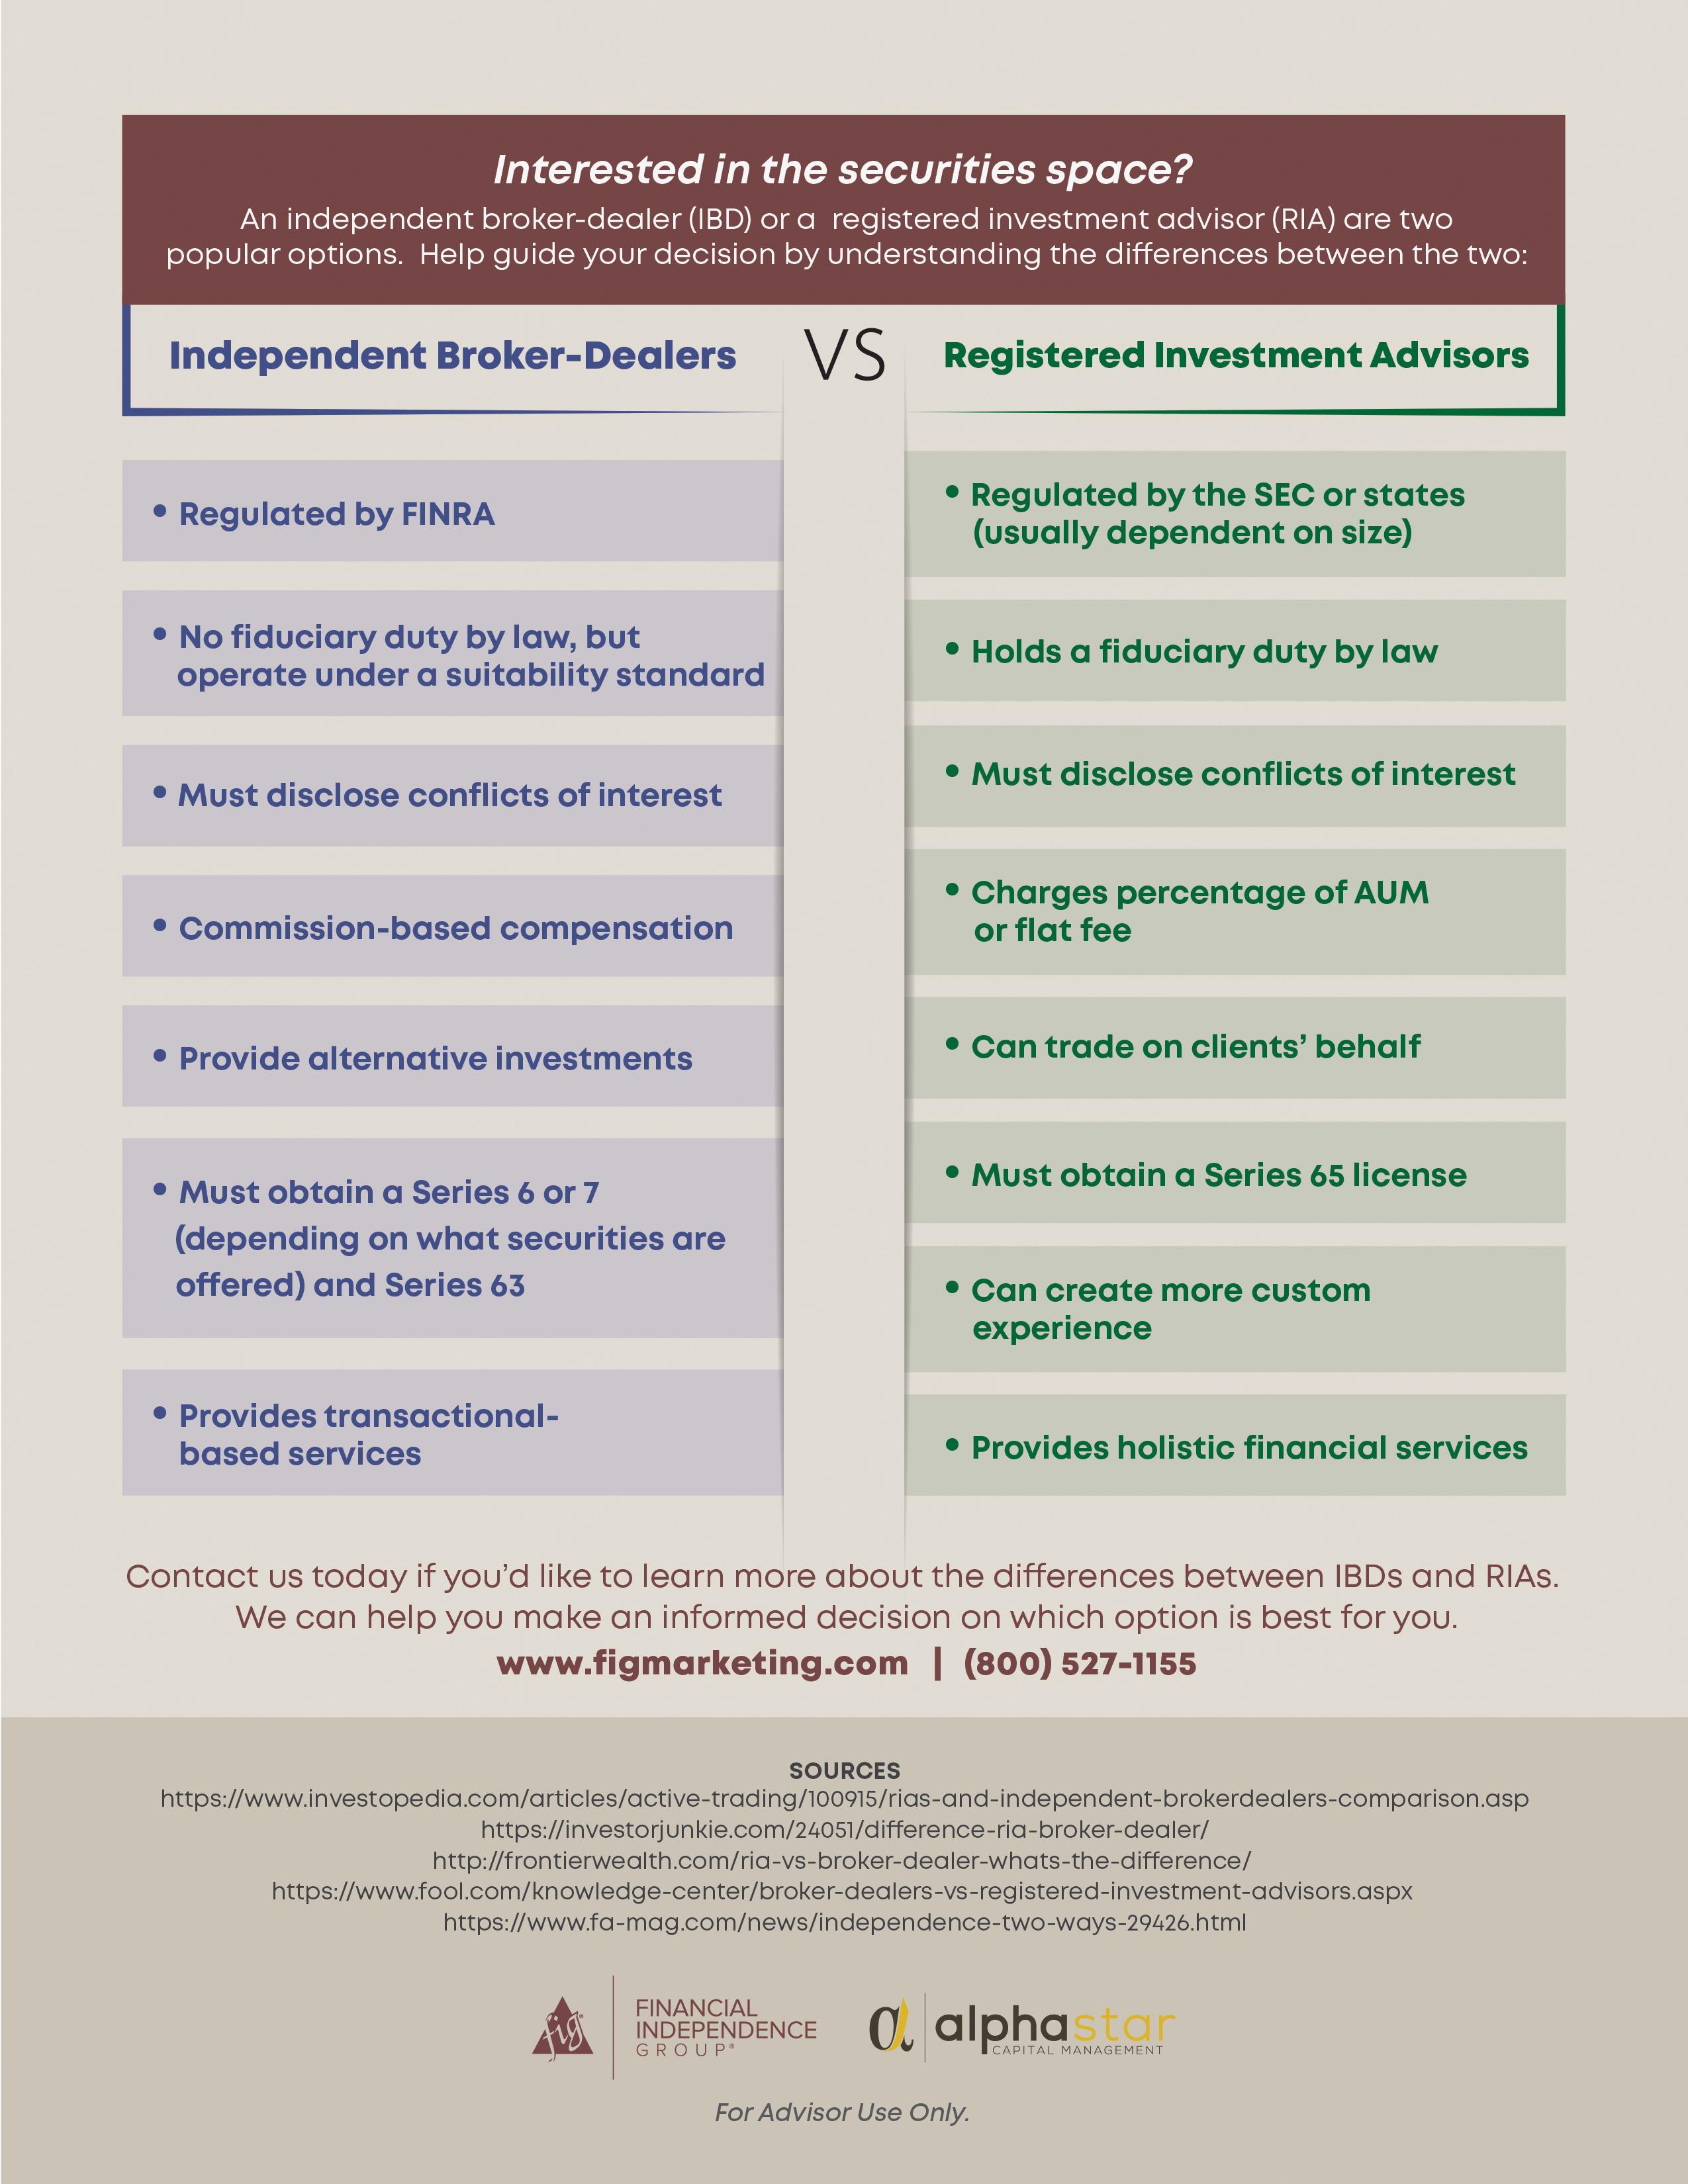 ibds vs rias infographic